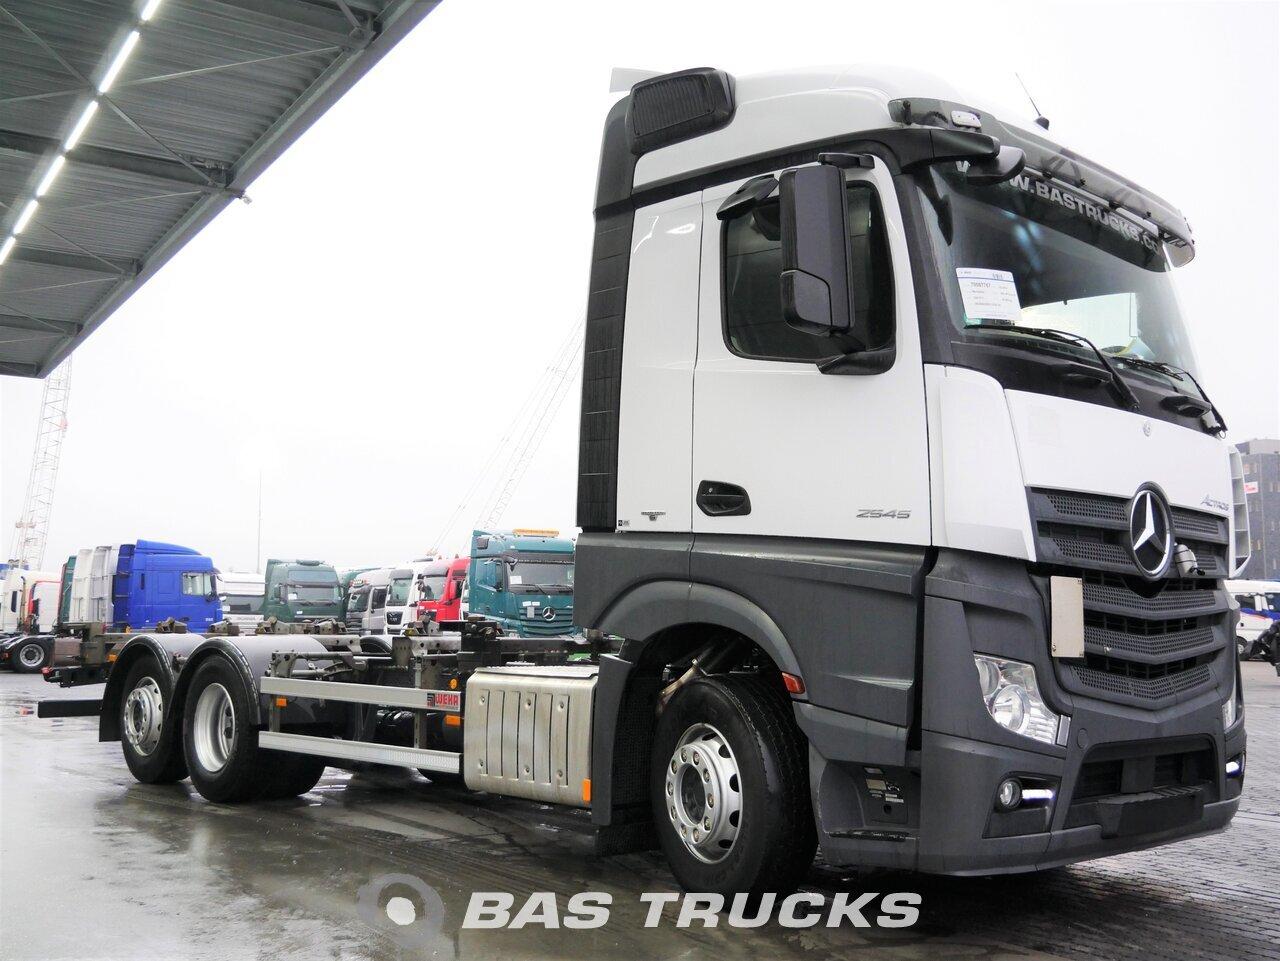 mercedes actros 2545 ll camion euro 6 27800 bas trucks. Black Bedroom Furniture Sets. Home Design Ideas